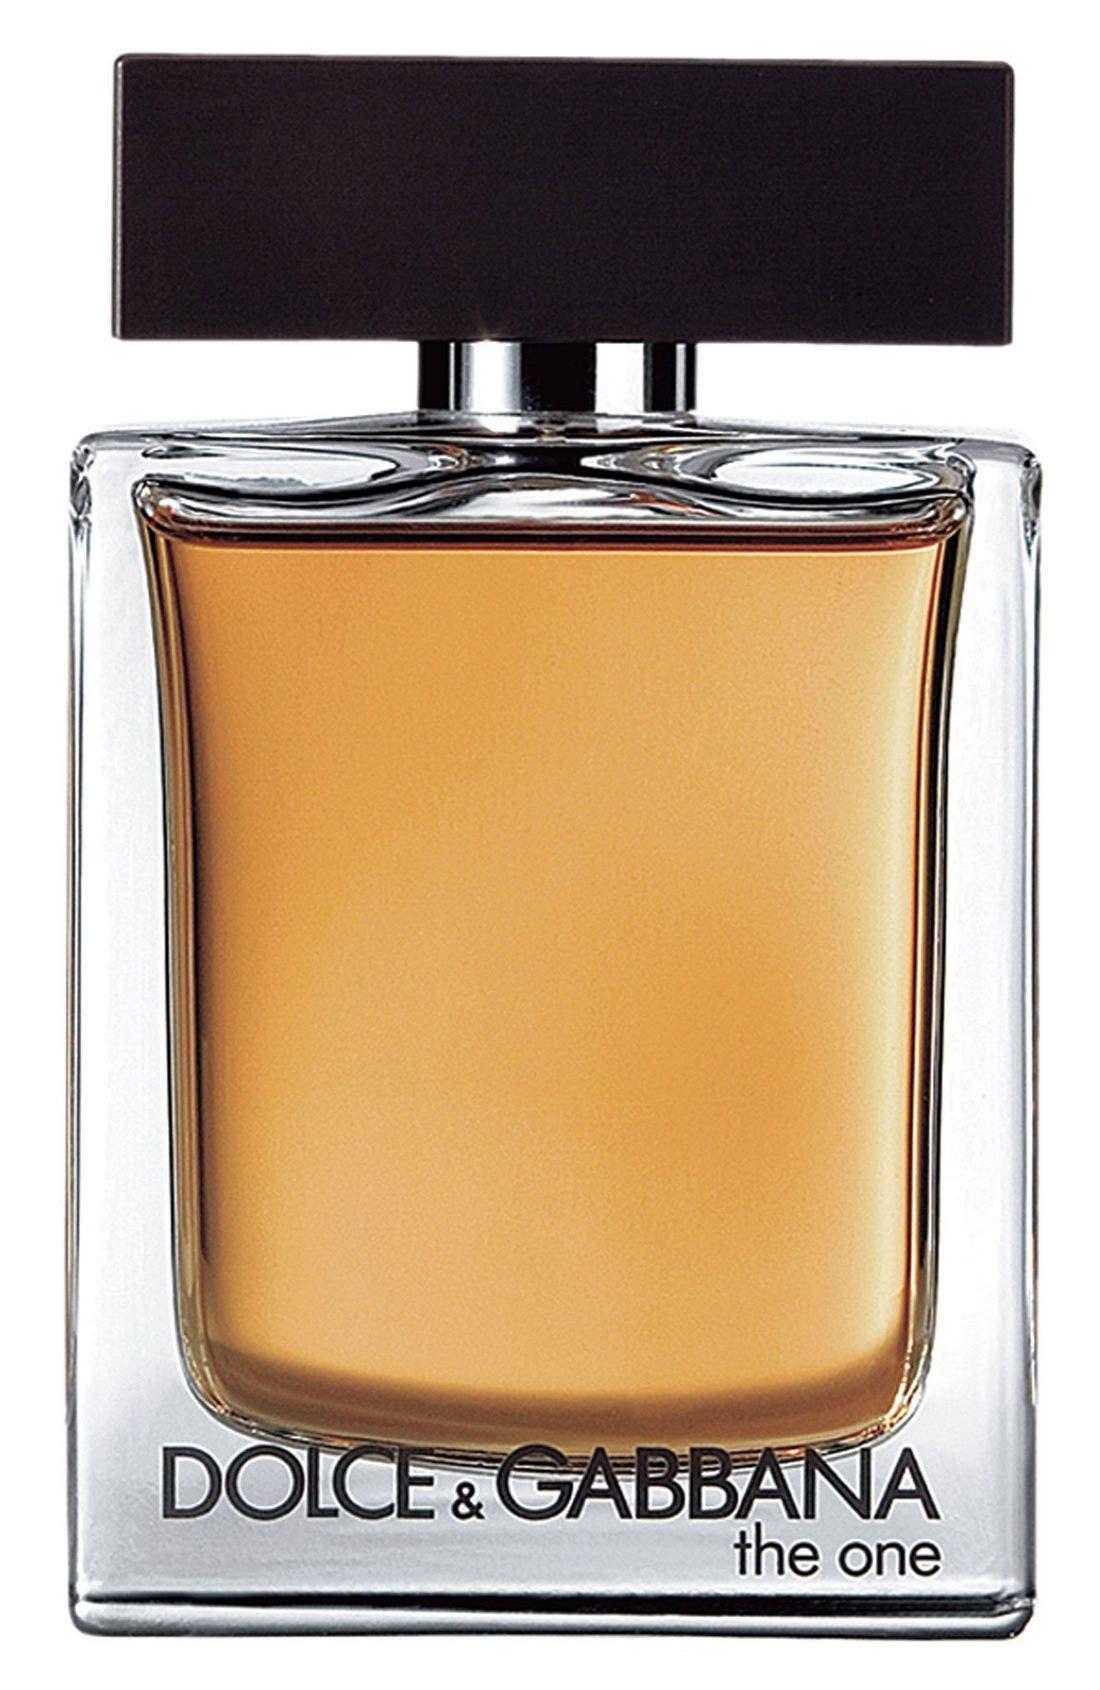 Dolce&Gabbana Beauty 'The One for Men' Eau de Toilette Spray